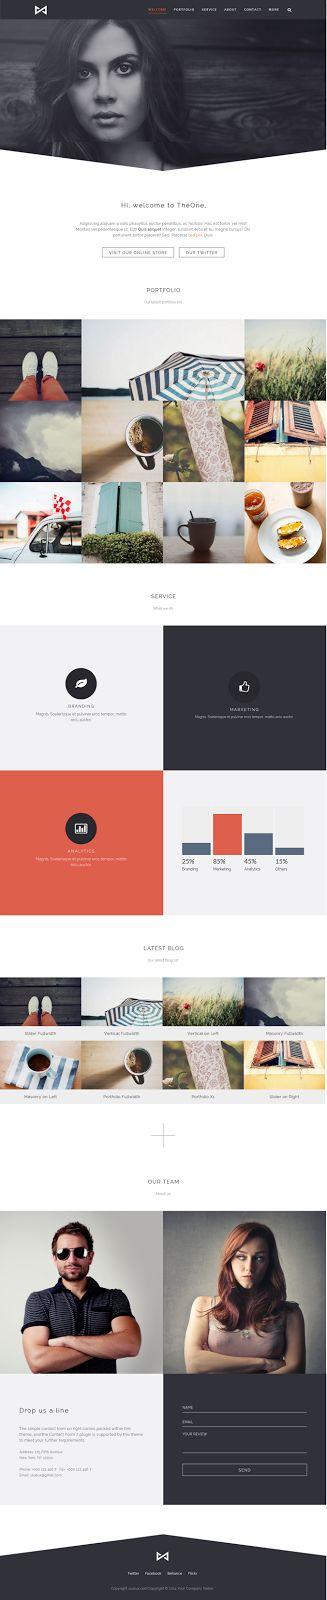 THEONE Parallax Onepage WordPress Theme #webdesign